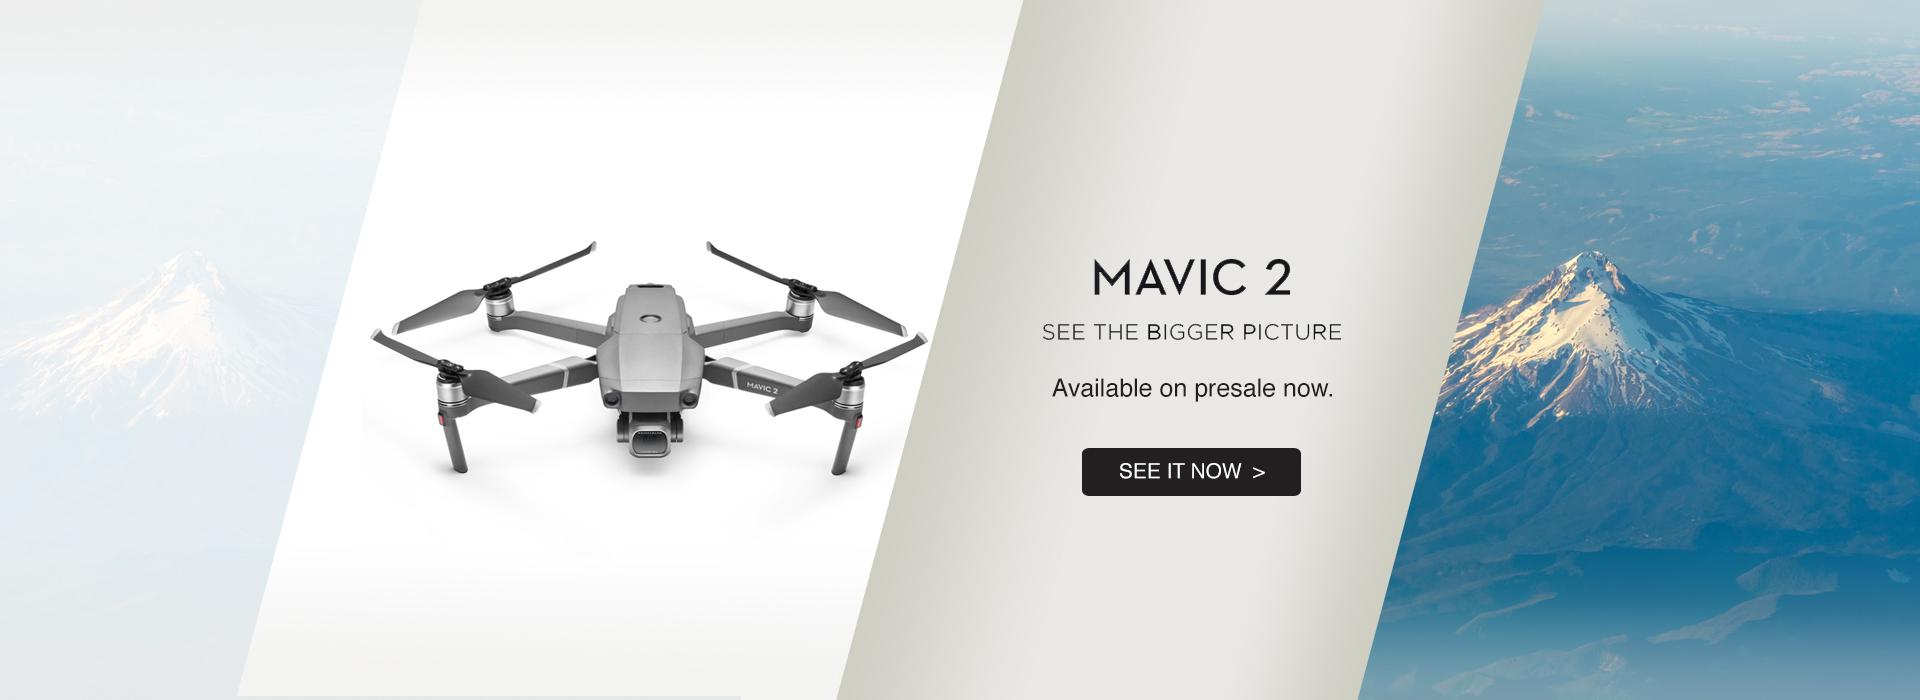 Mavic 2 Pre-Order